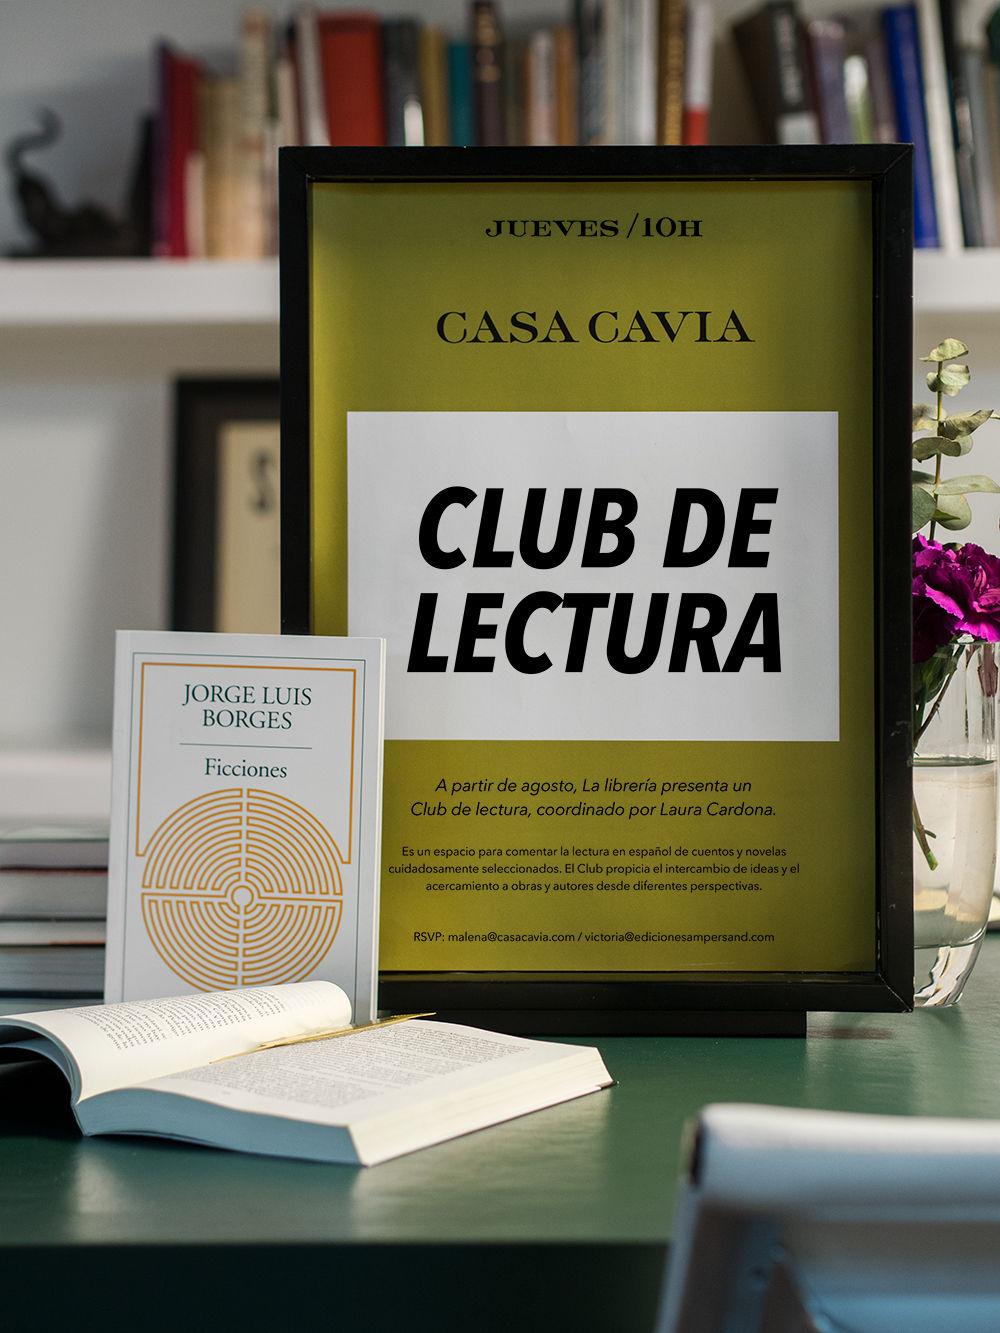 Club de lectura Casa Cavia